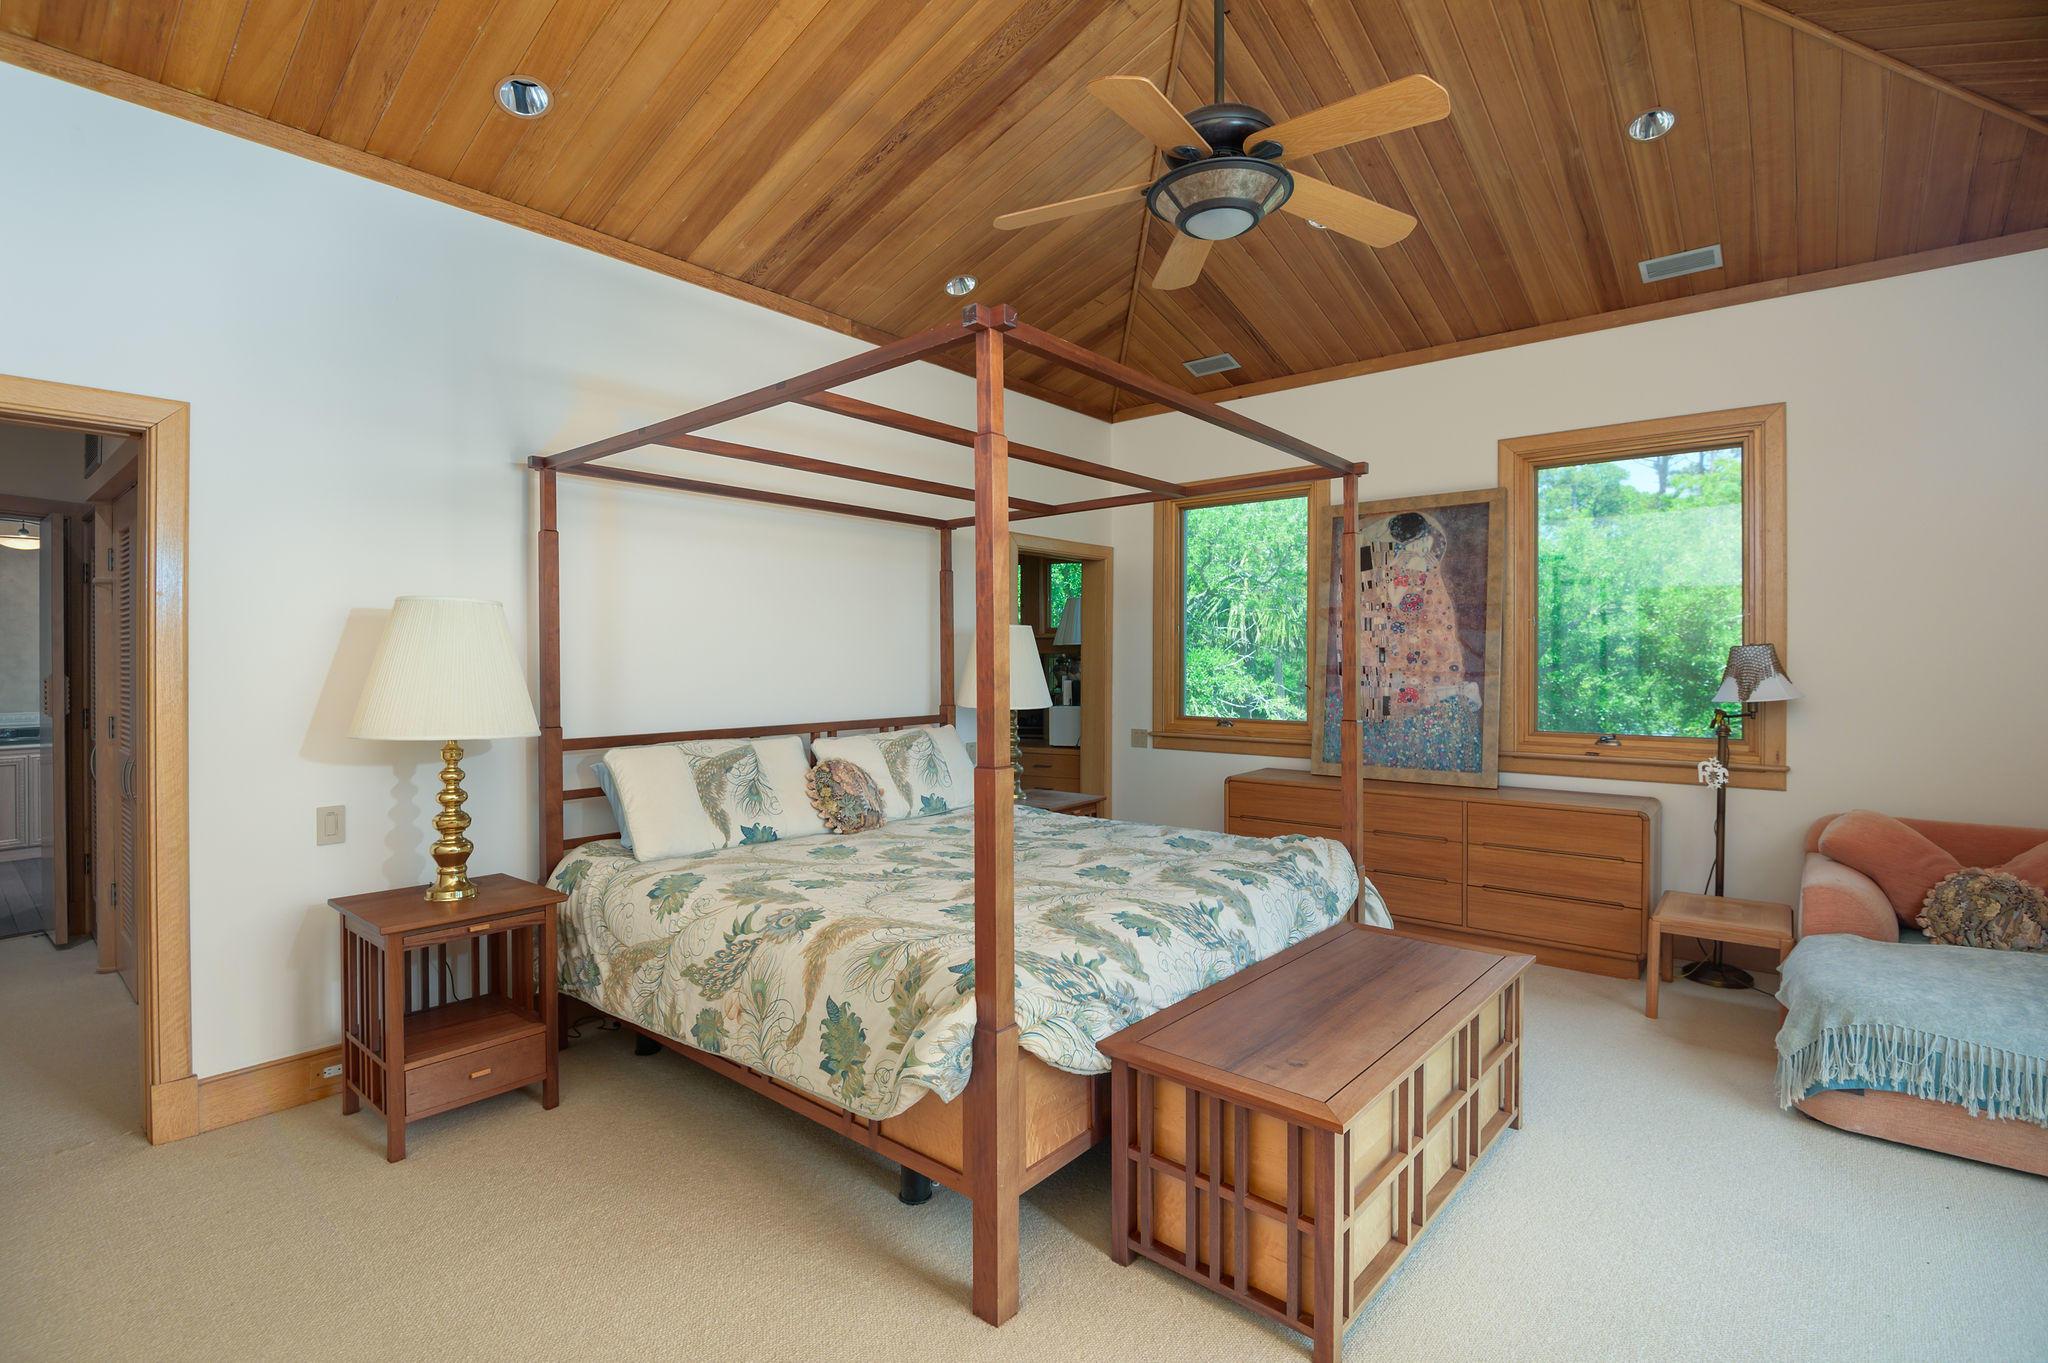 Seabrook Island Homes For Sale - 3087 Marshgate, Seabrook Island, SC - 11